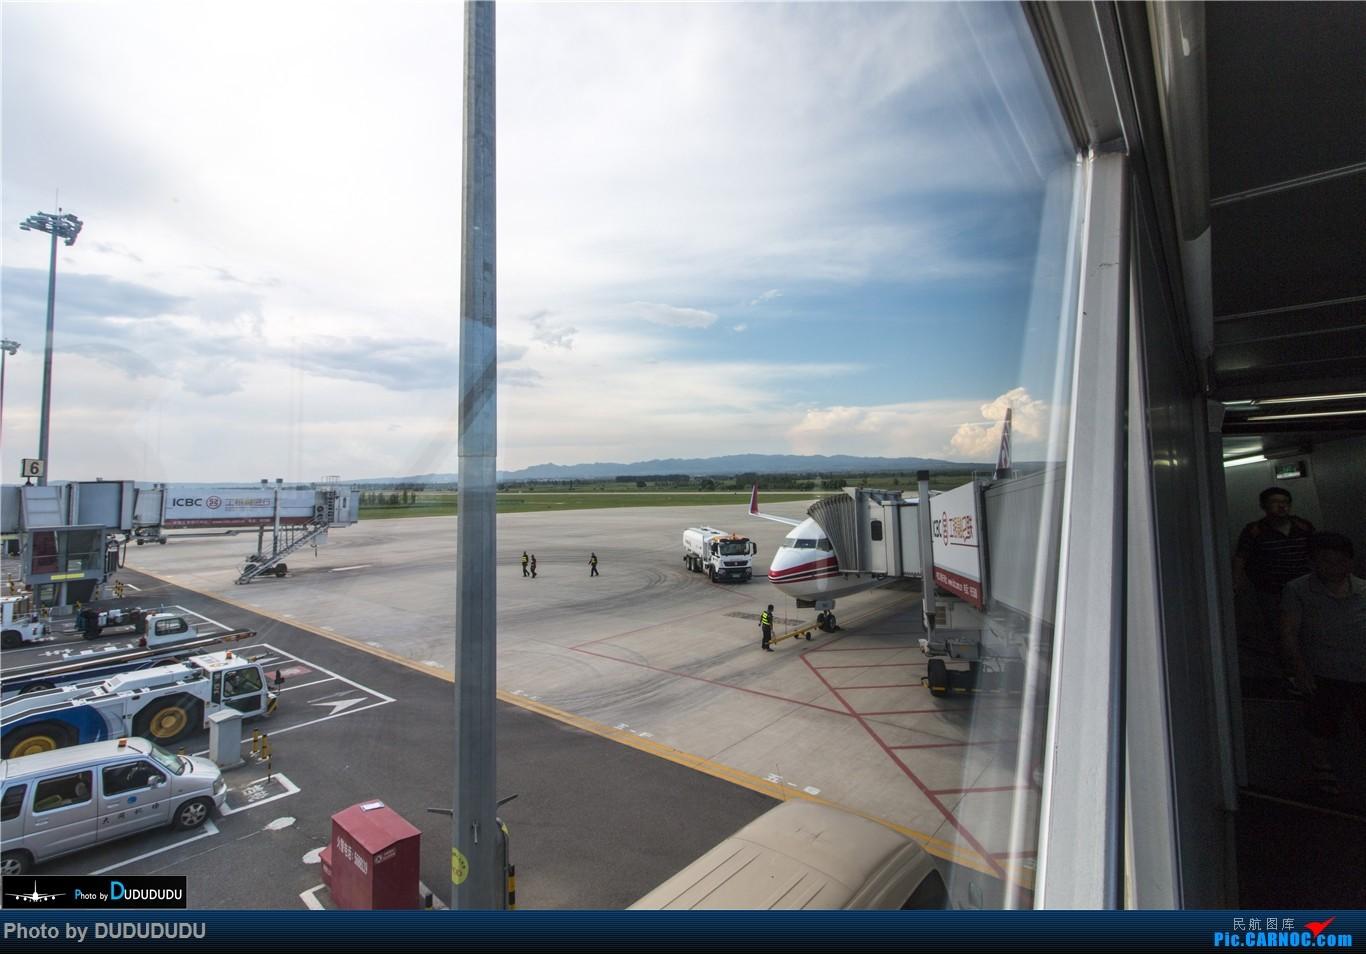 Re:[原创]【DUDUDUDU】暑期飞行合集 从A388到MA60 BOEING 737-800 B-7563 中国大同云冈机场